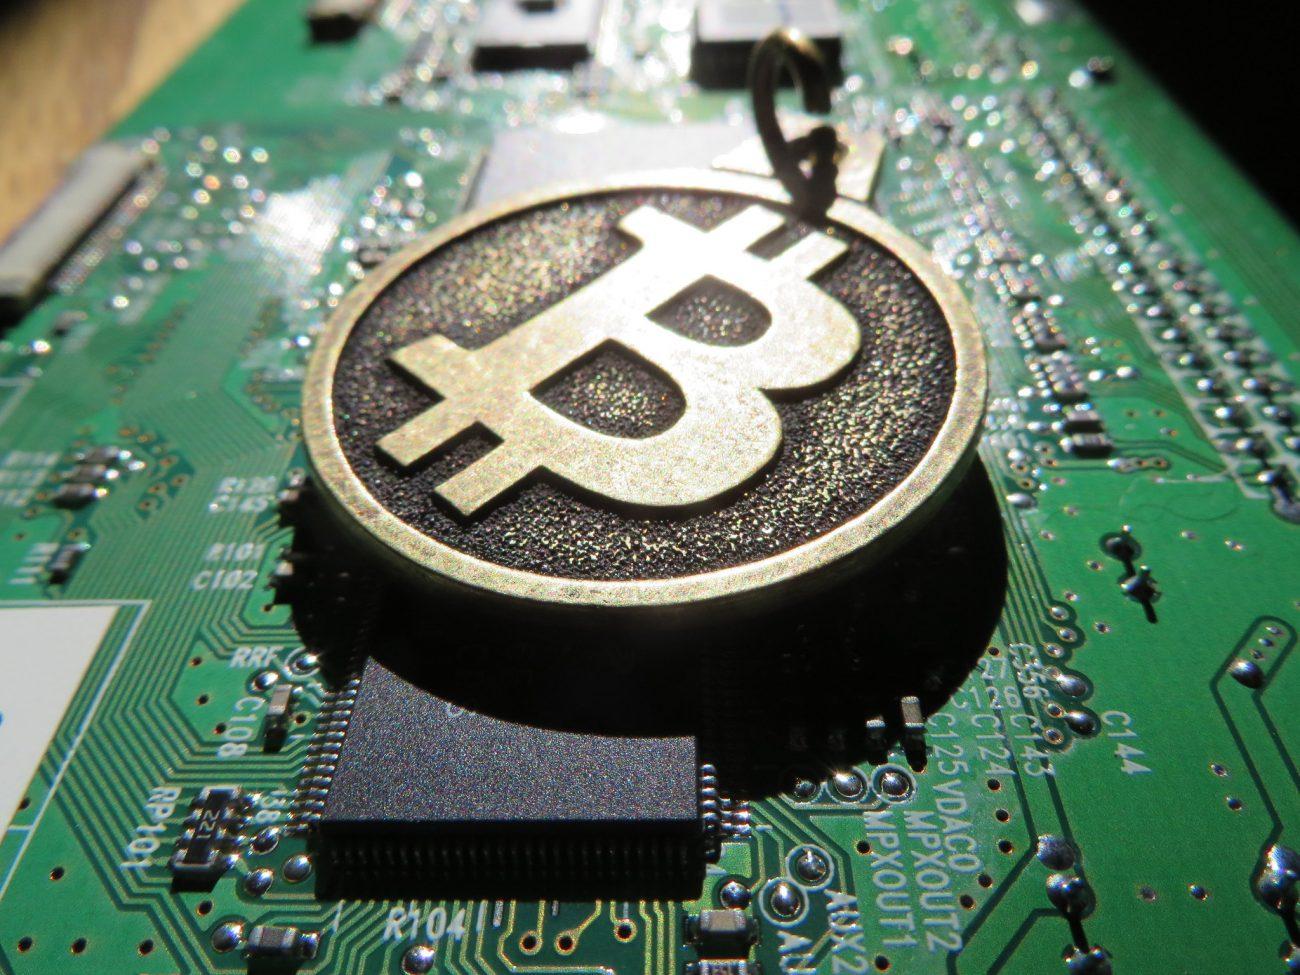 Cryptomonnaies Ouzbékistan Minage Mineur Tarif Electricité